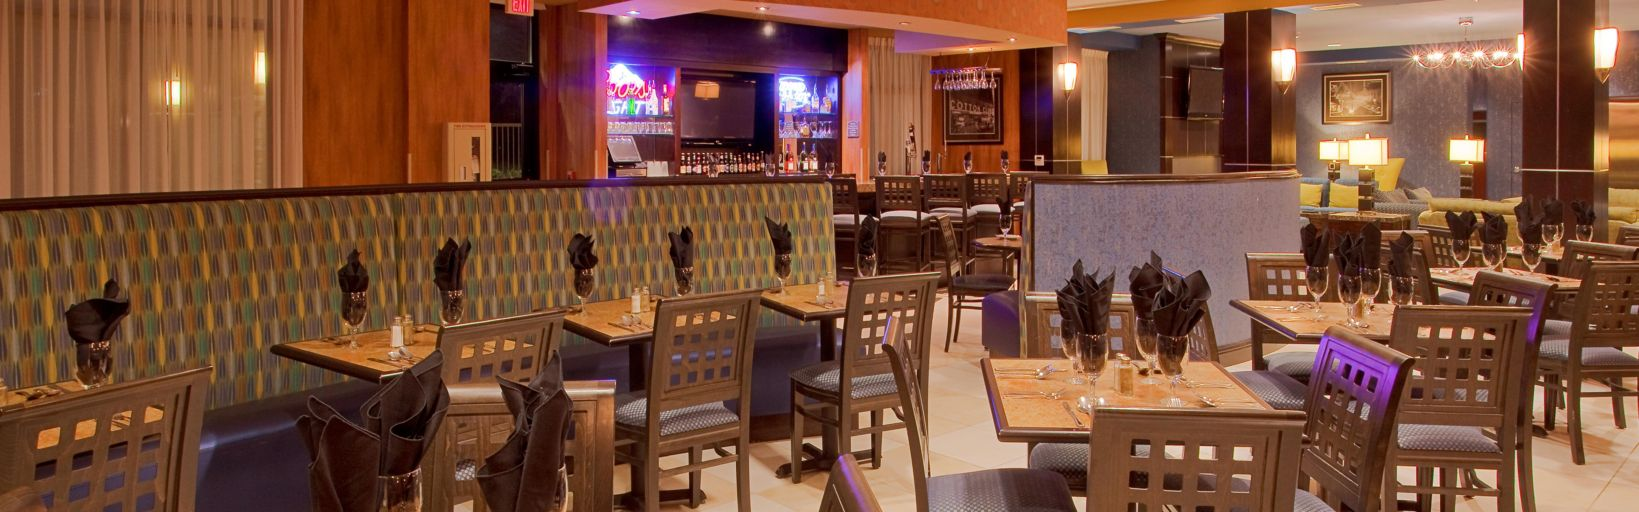 Restaurants Near Holiday Inn Fort Worth North Fossil Creek